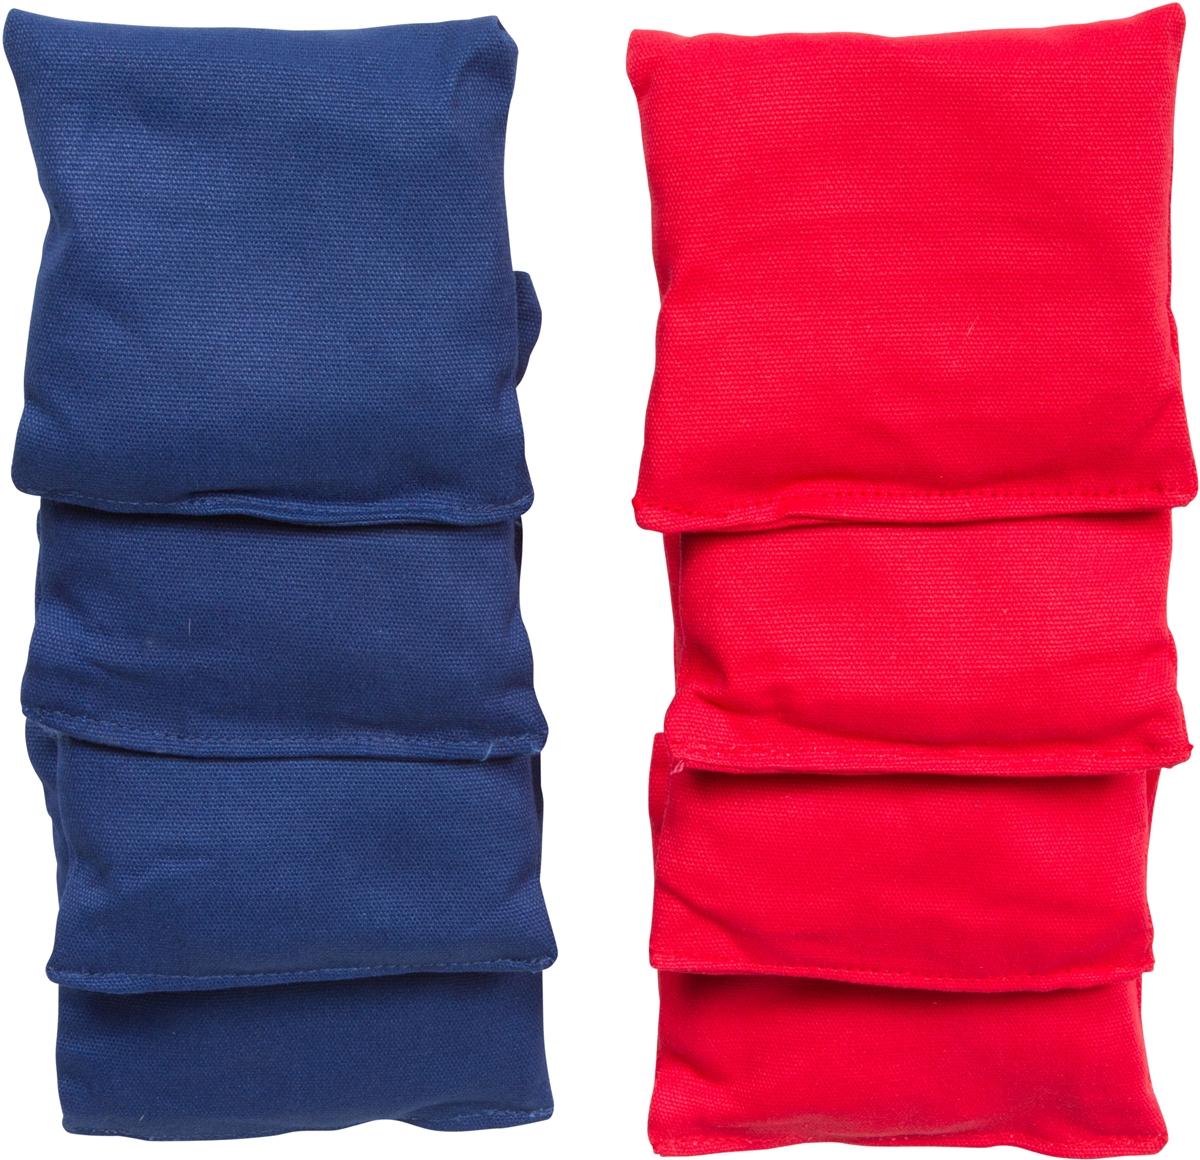 Magnificent Trademark Innovations Bean Bag Toss Set 4 Feet Long 8 Bags Included Creativecarmelina Interior Chair Design Creativecarmelinacom